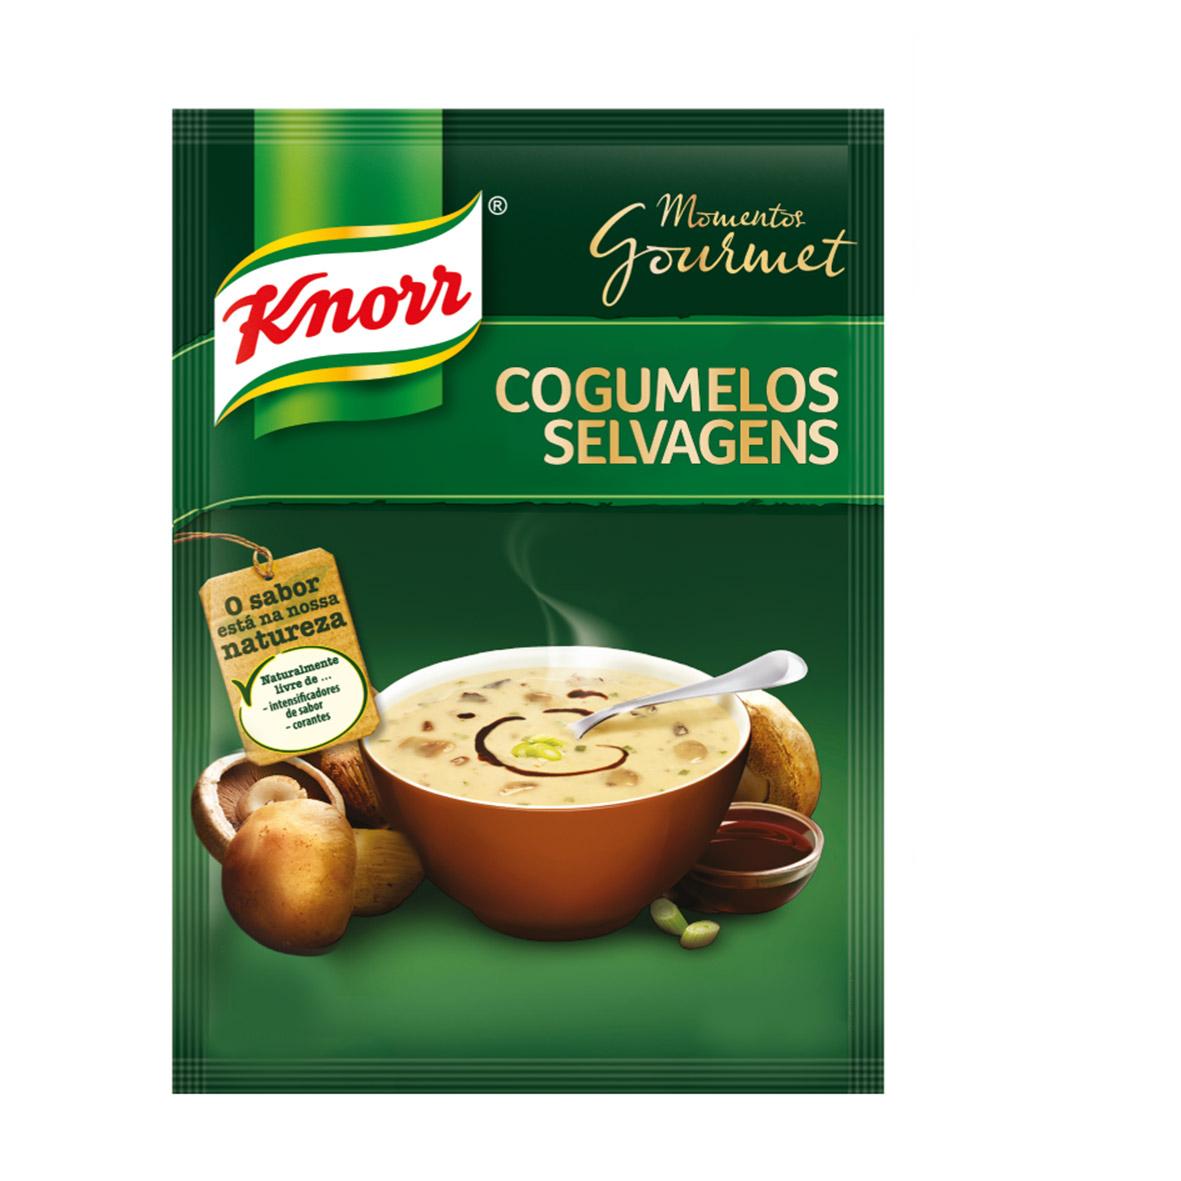 Sopa Knorr Cogumelos Selvagens Gourmet 61g